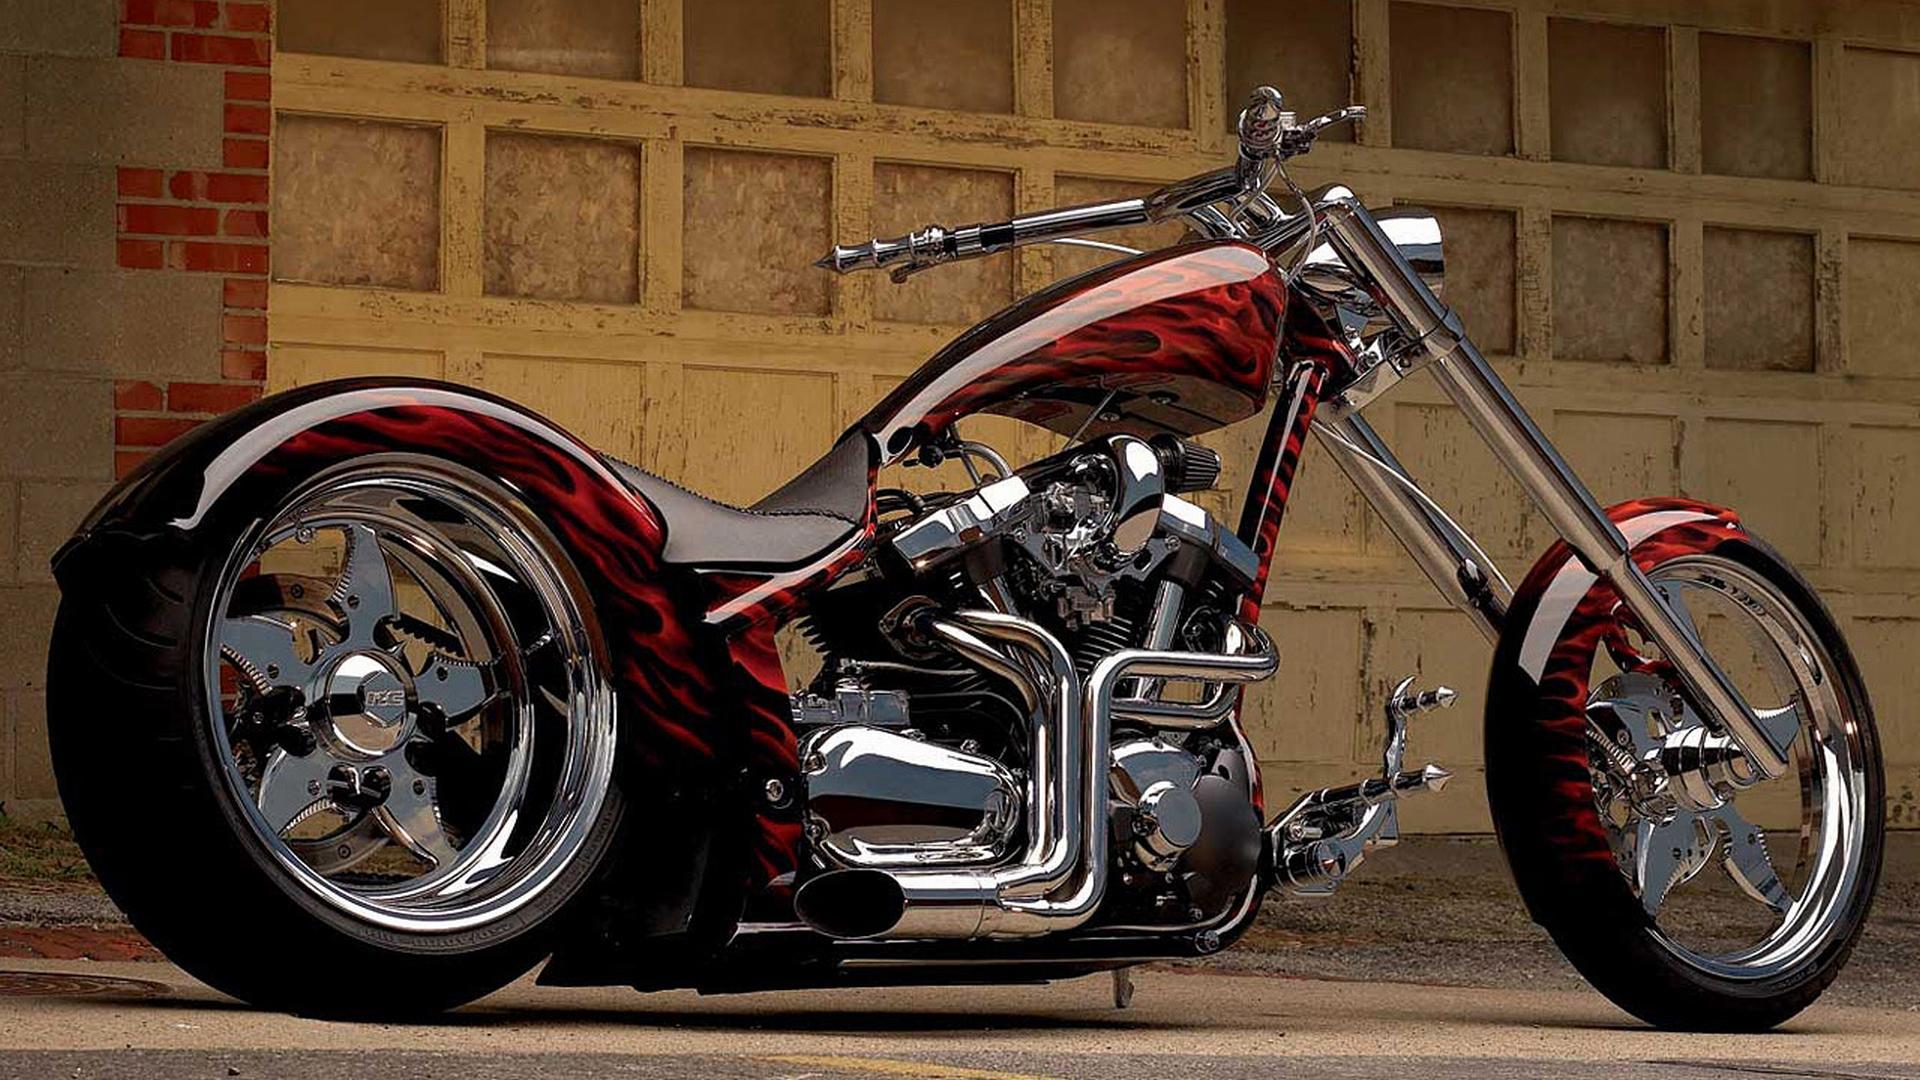 Motorcycles Yamaha Chopper HD Wallpaper